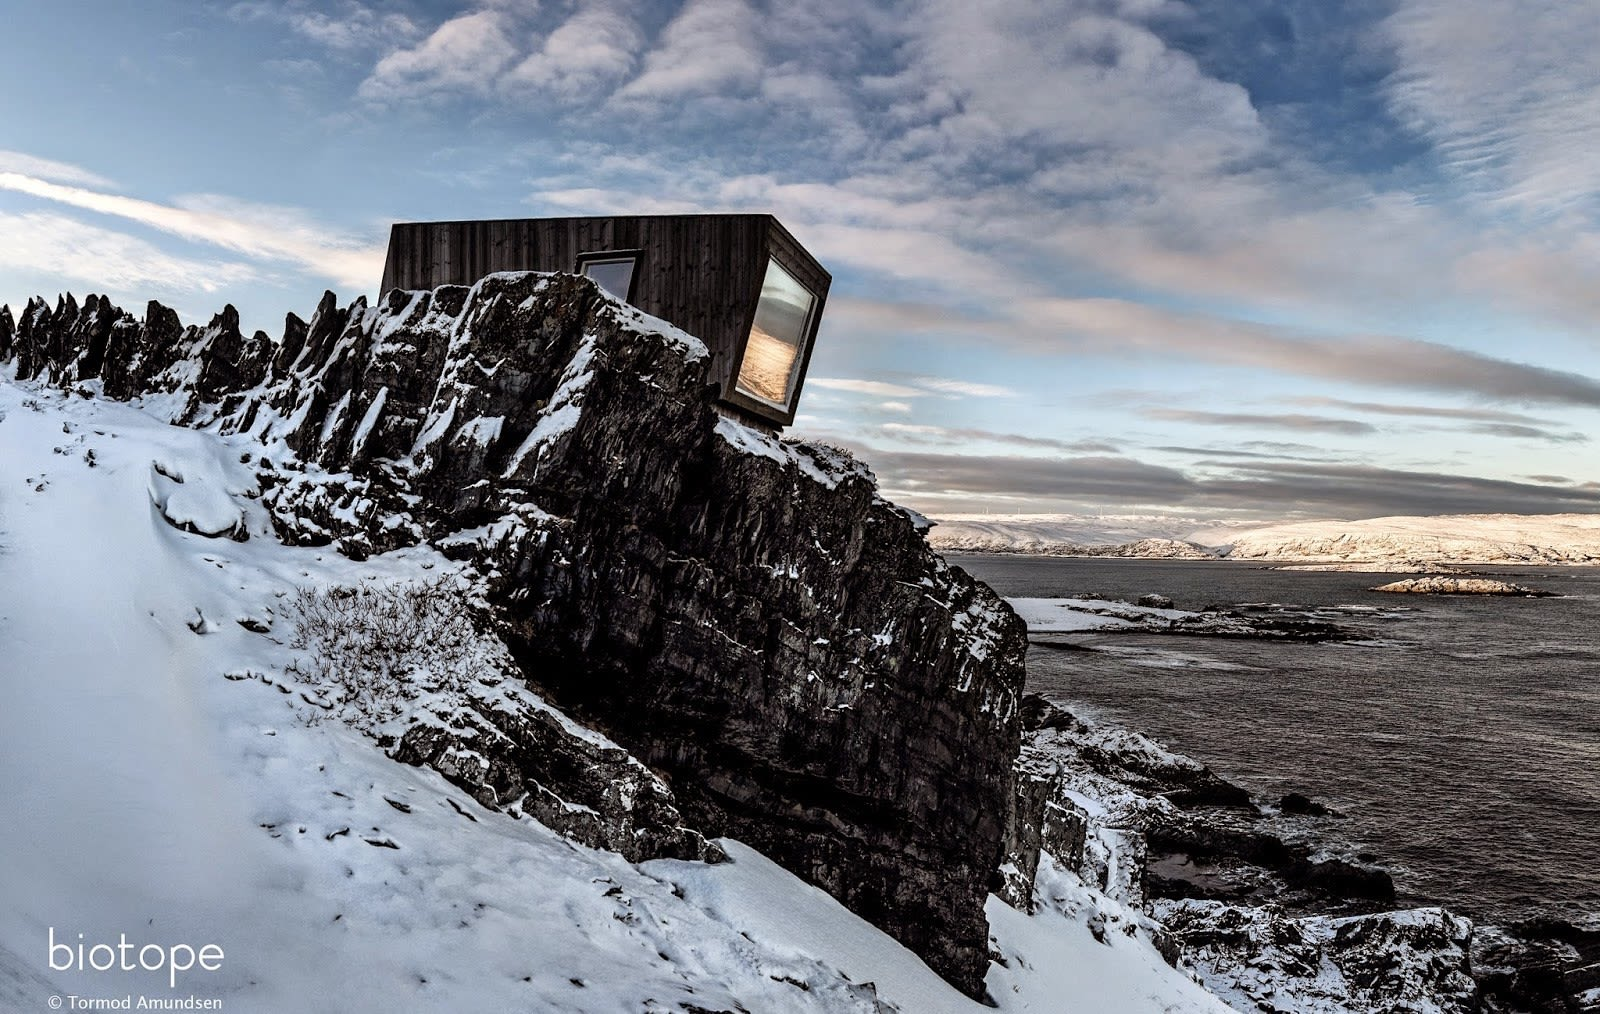 Swarovski Optik Telescope nature Kongsfjord bird hide wind shelter - sign Tormod Amundsen